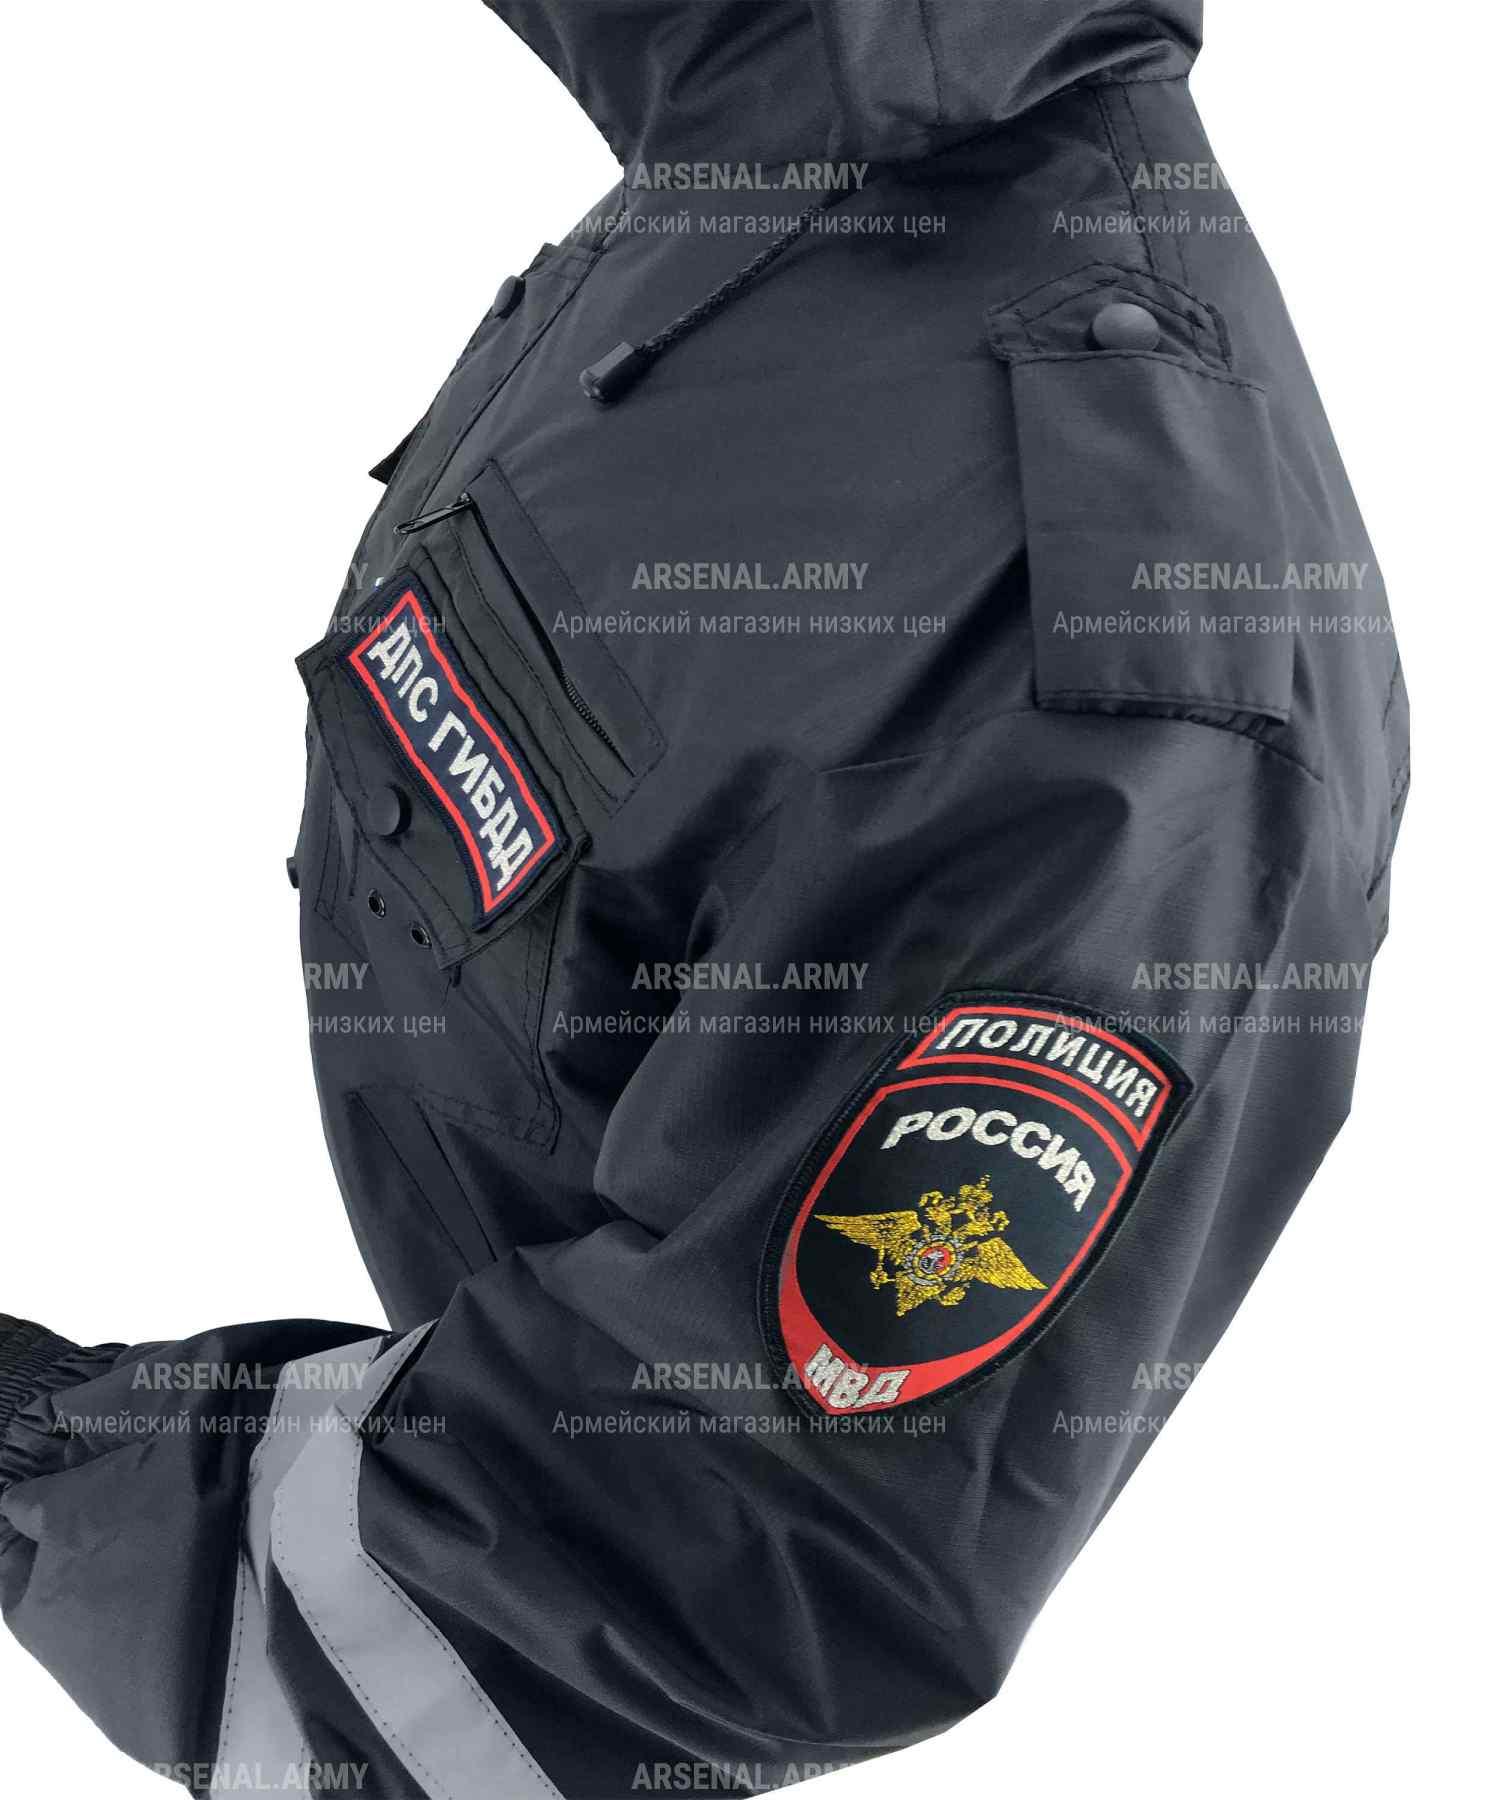 Ветровка ДПС полиция без синтепона